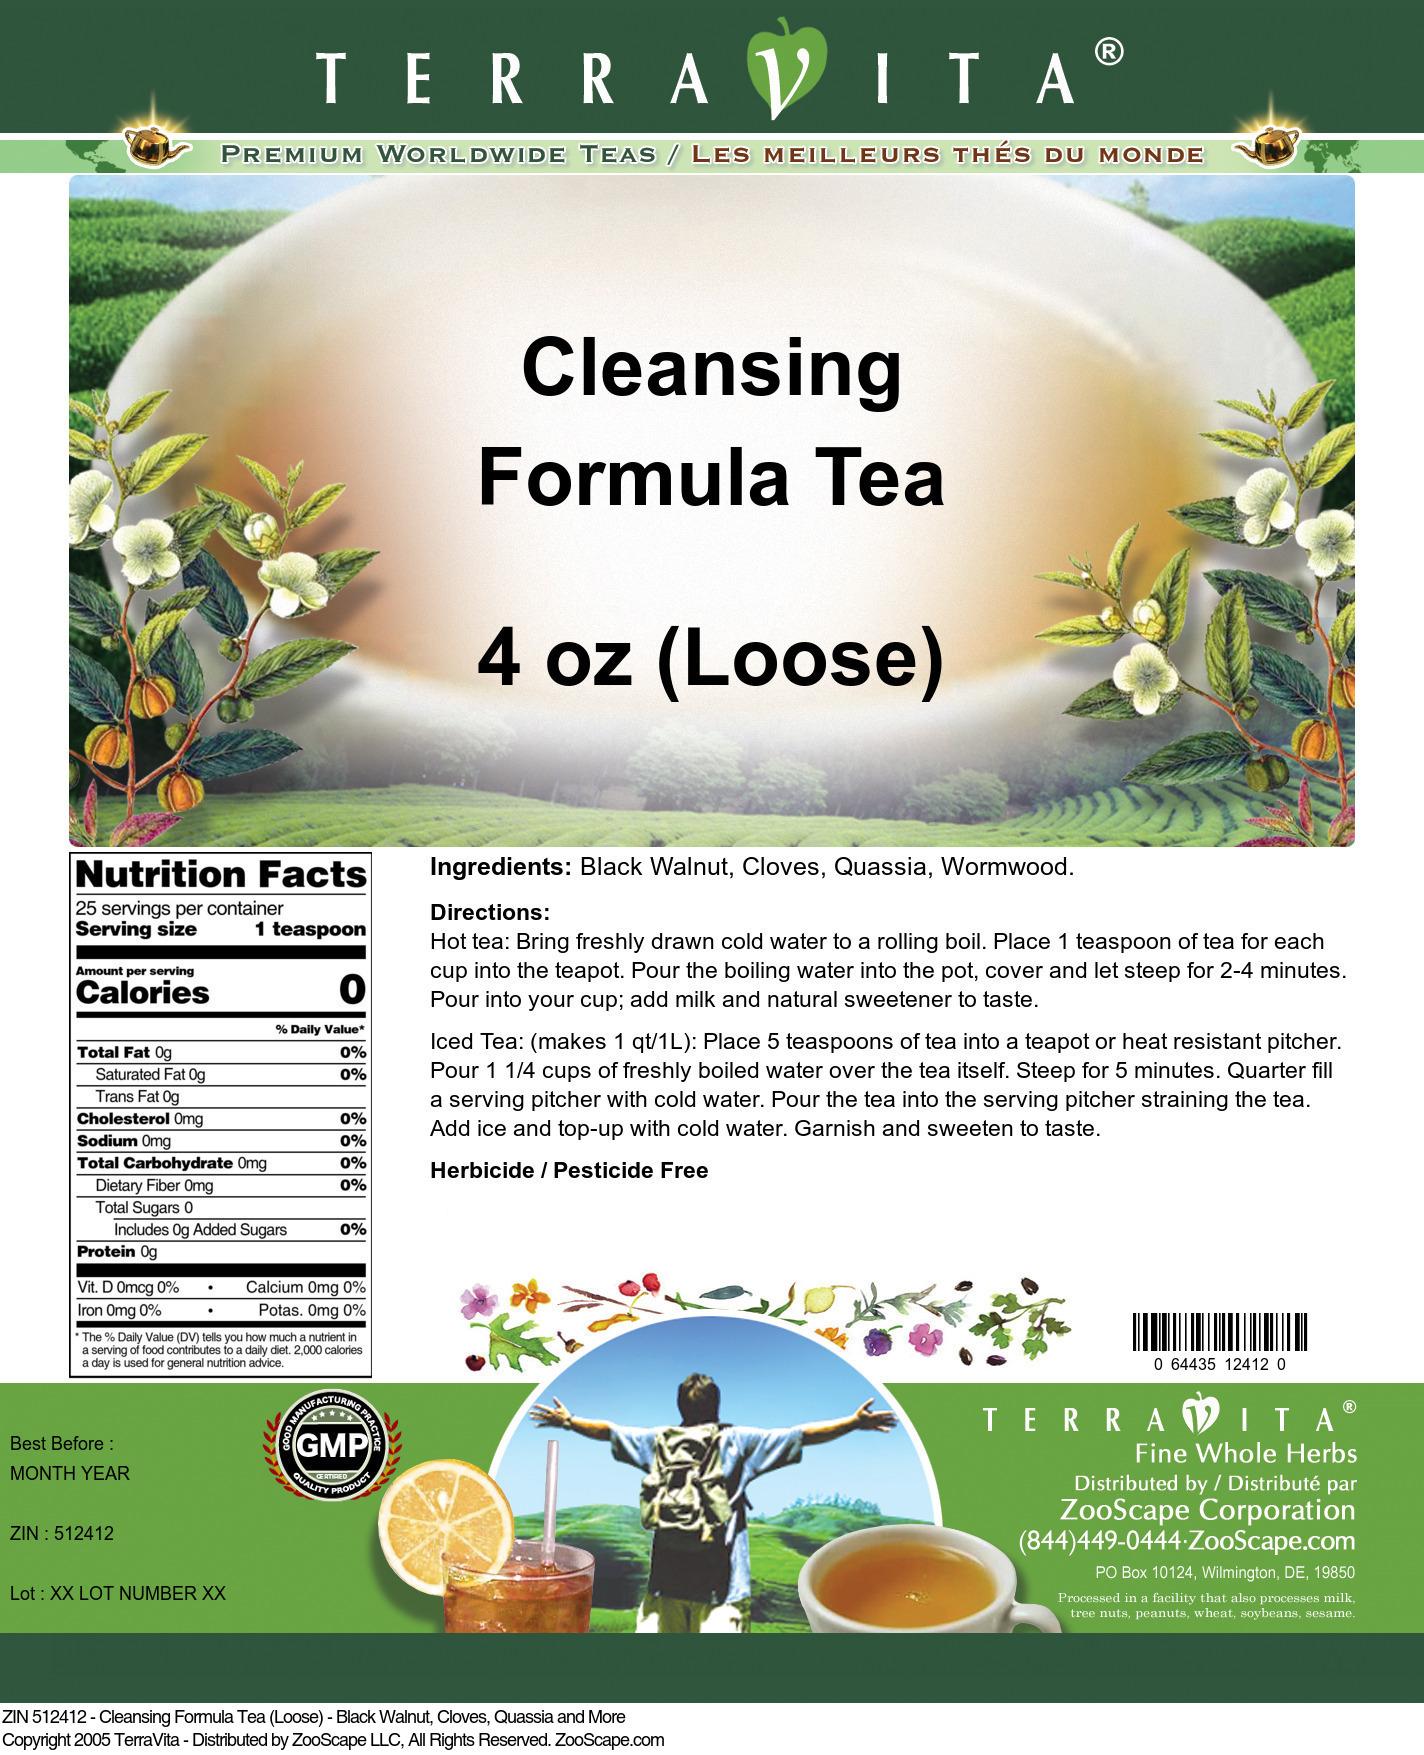 Cleansing Formula Tea (Loose) - Black Walnut, Cloves, Quassia and More